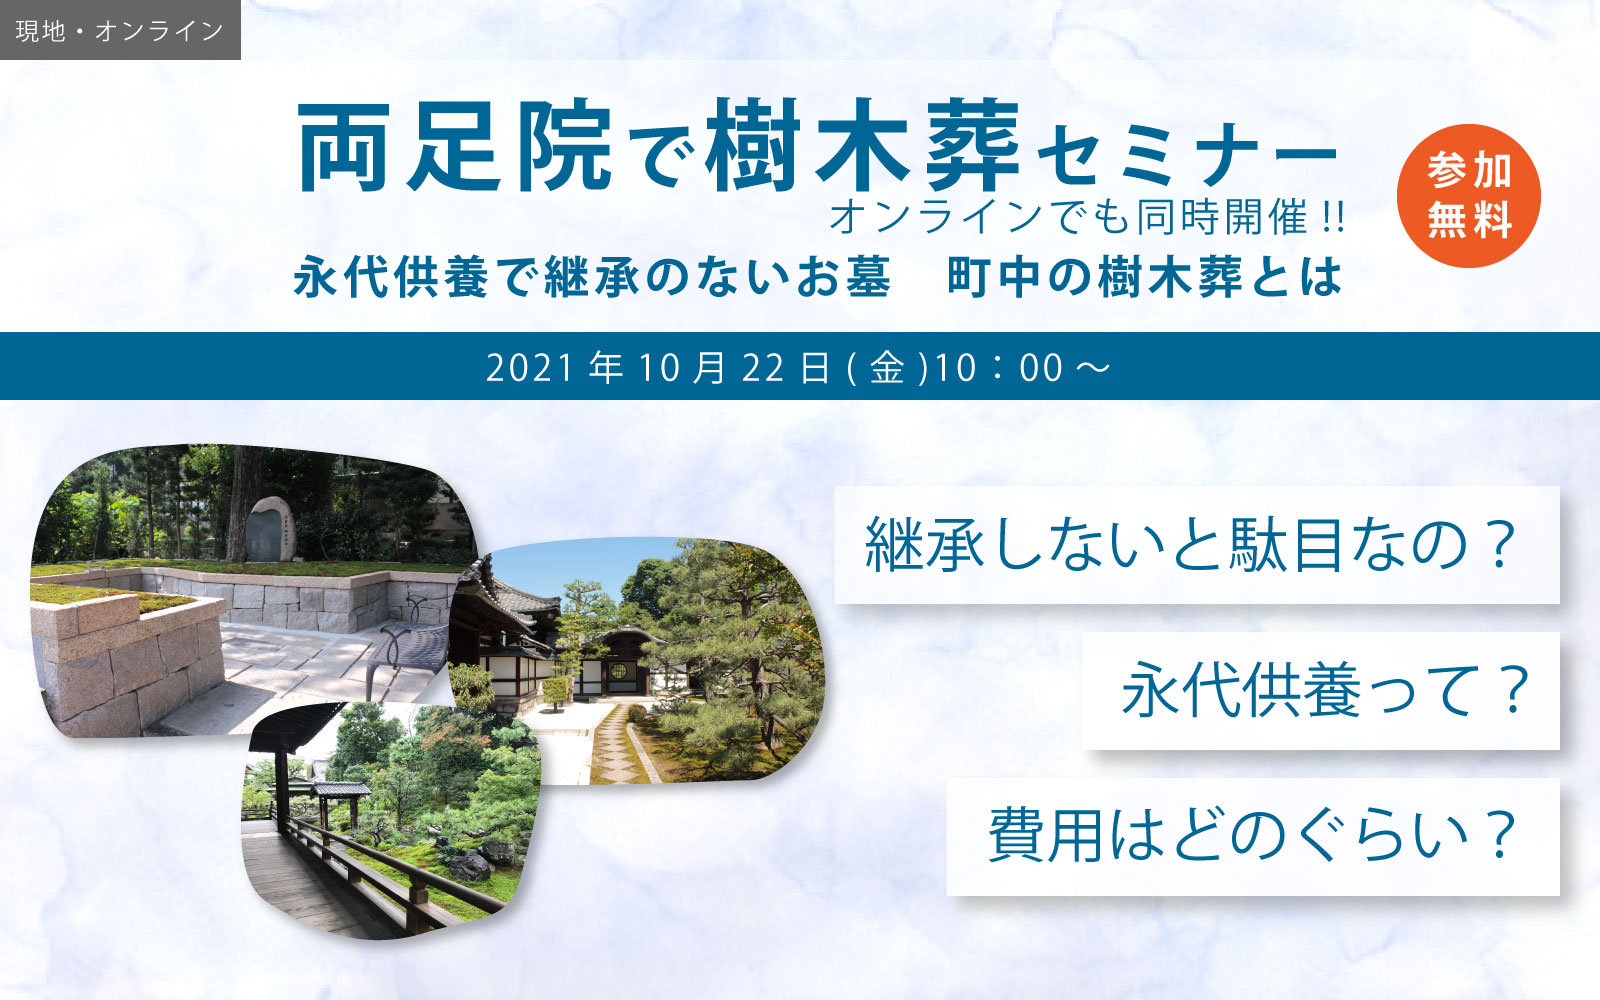 両足院樹木葬セミナー2021年10月22日開催